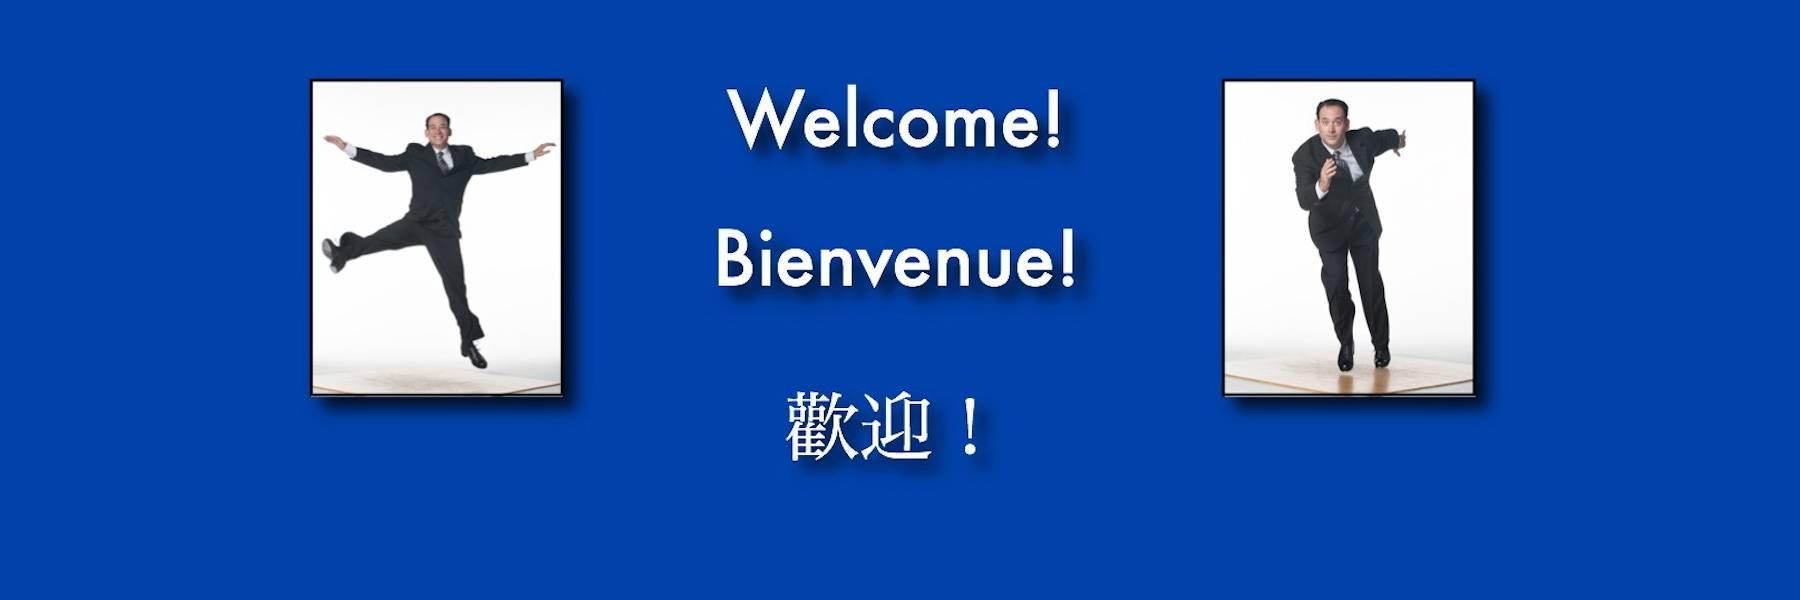 Welcome!  Bienvenue!  歡迎!